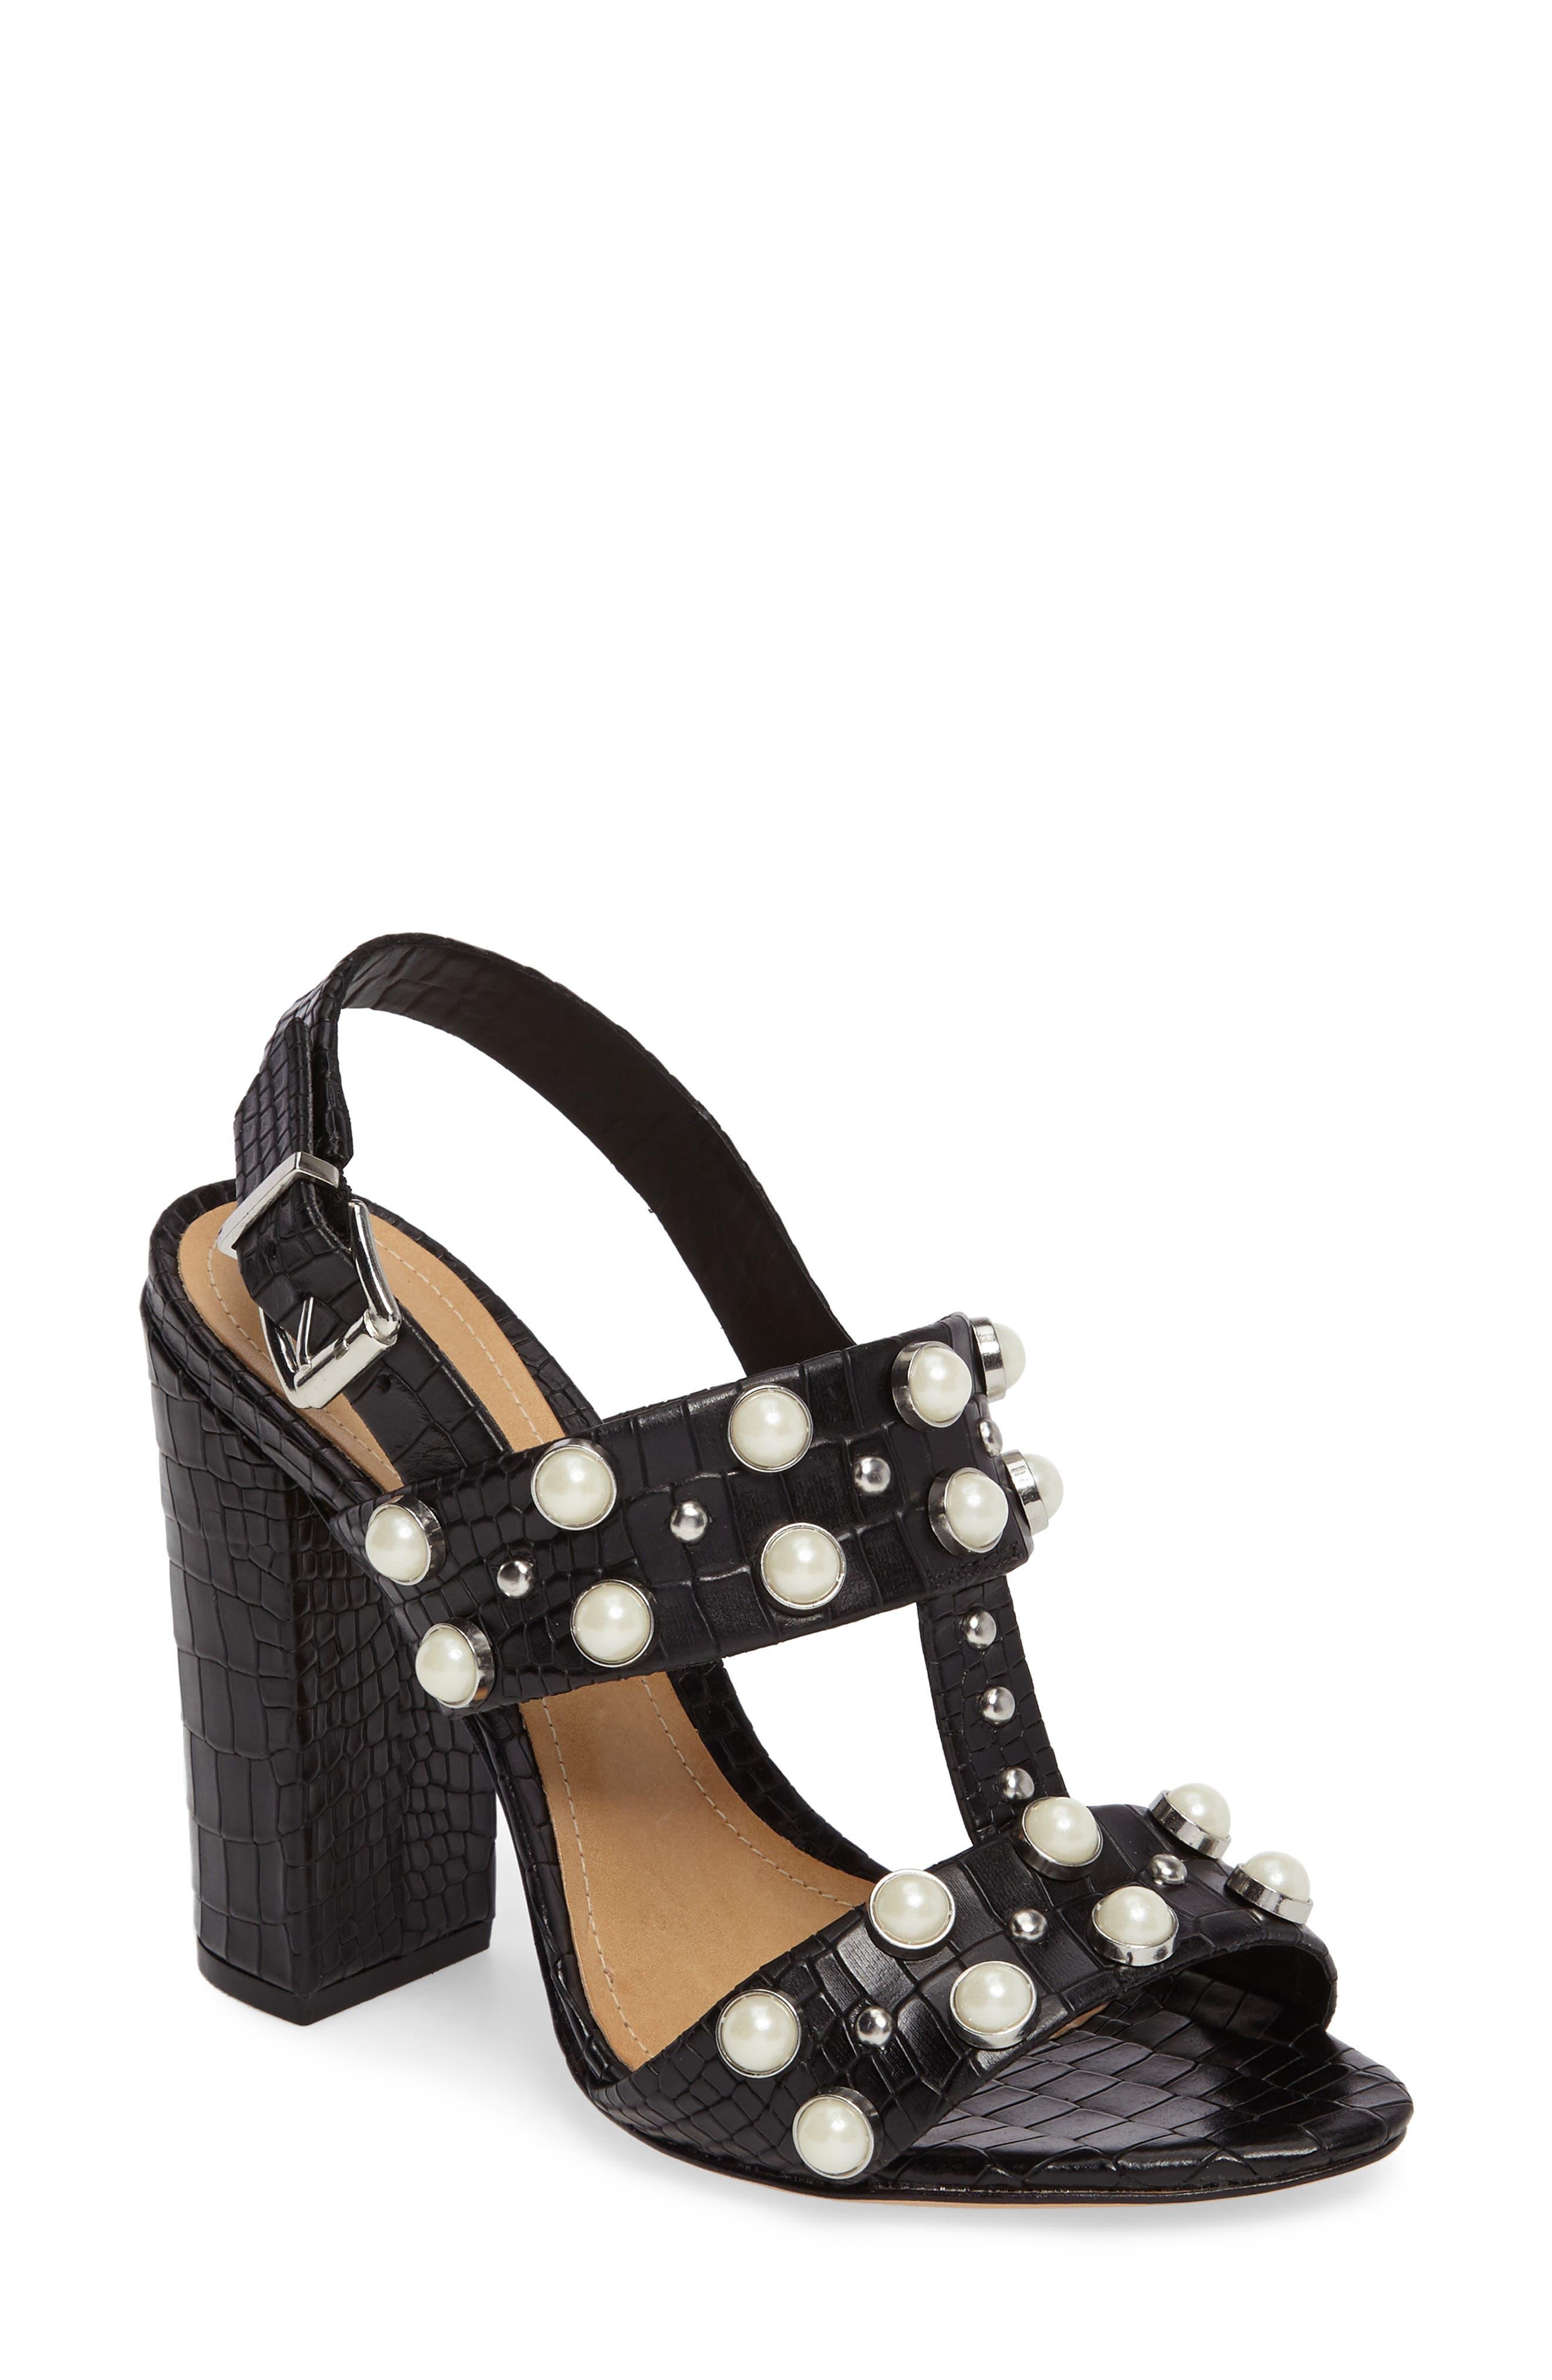 Main Image - Schutz Zarita Imitation Pearl Embellished Sandal (Women)